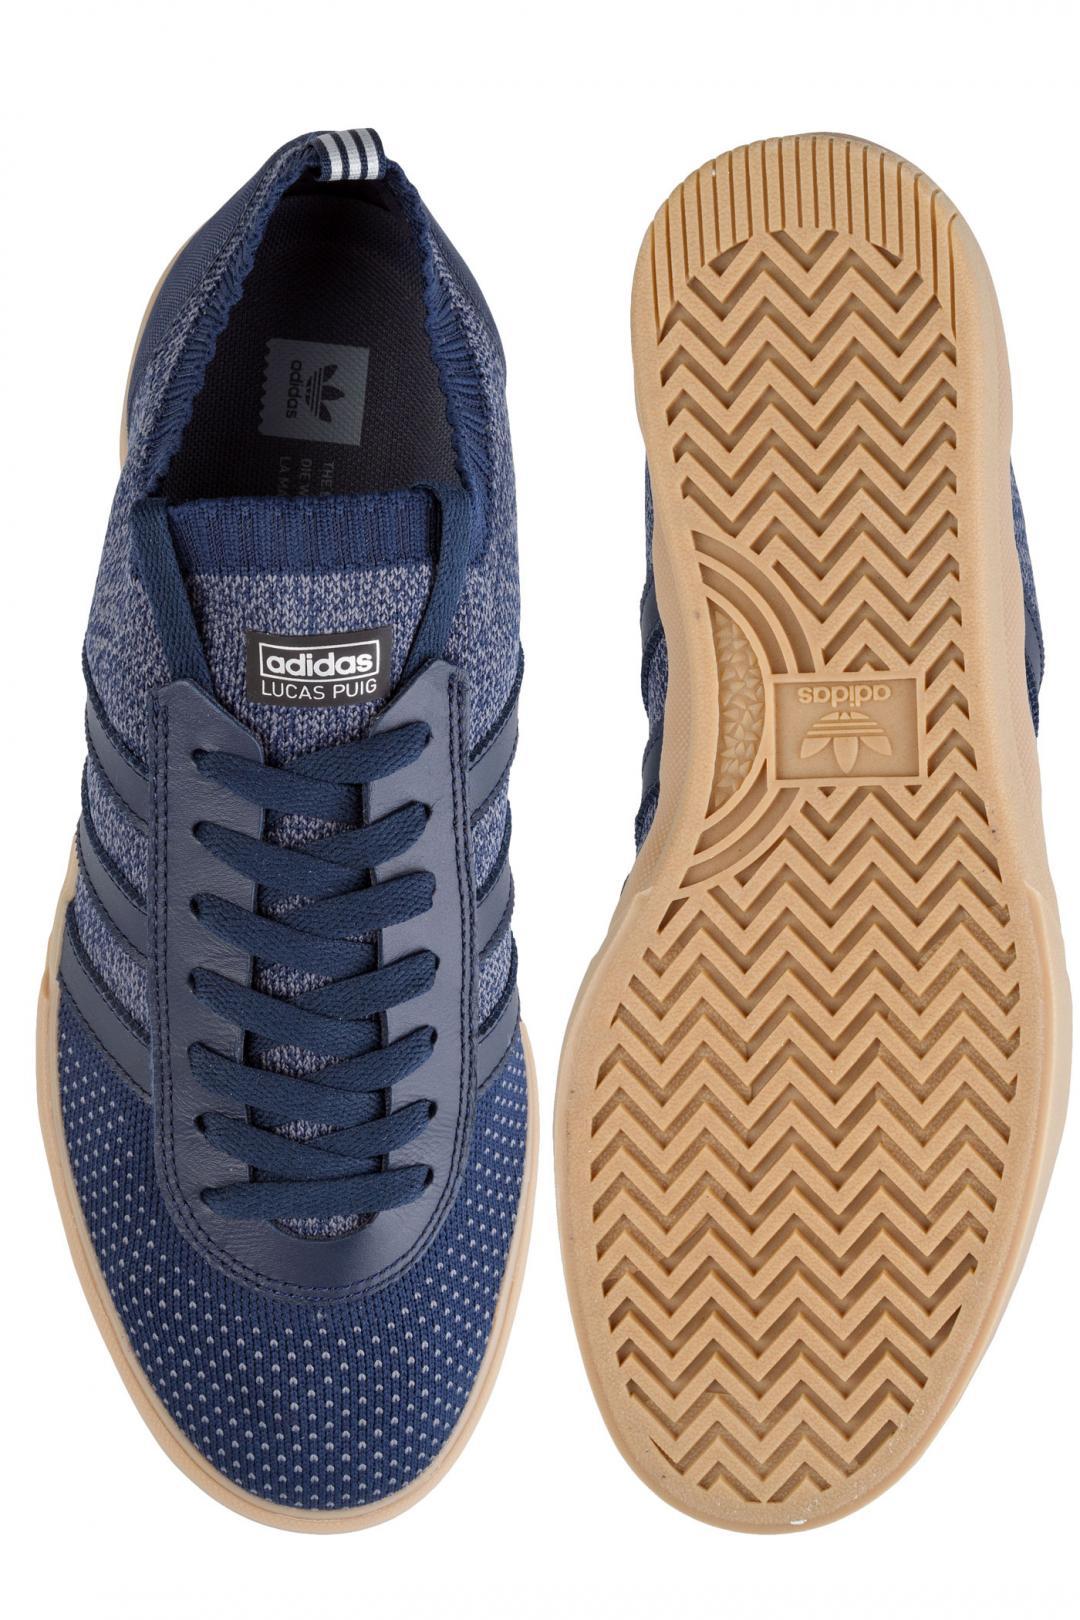 Uomo adidas Skateboarding Lucas Premiere PK collegiate navy onix | Sneakers low top